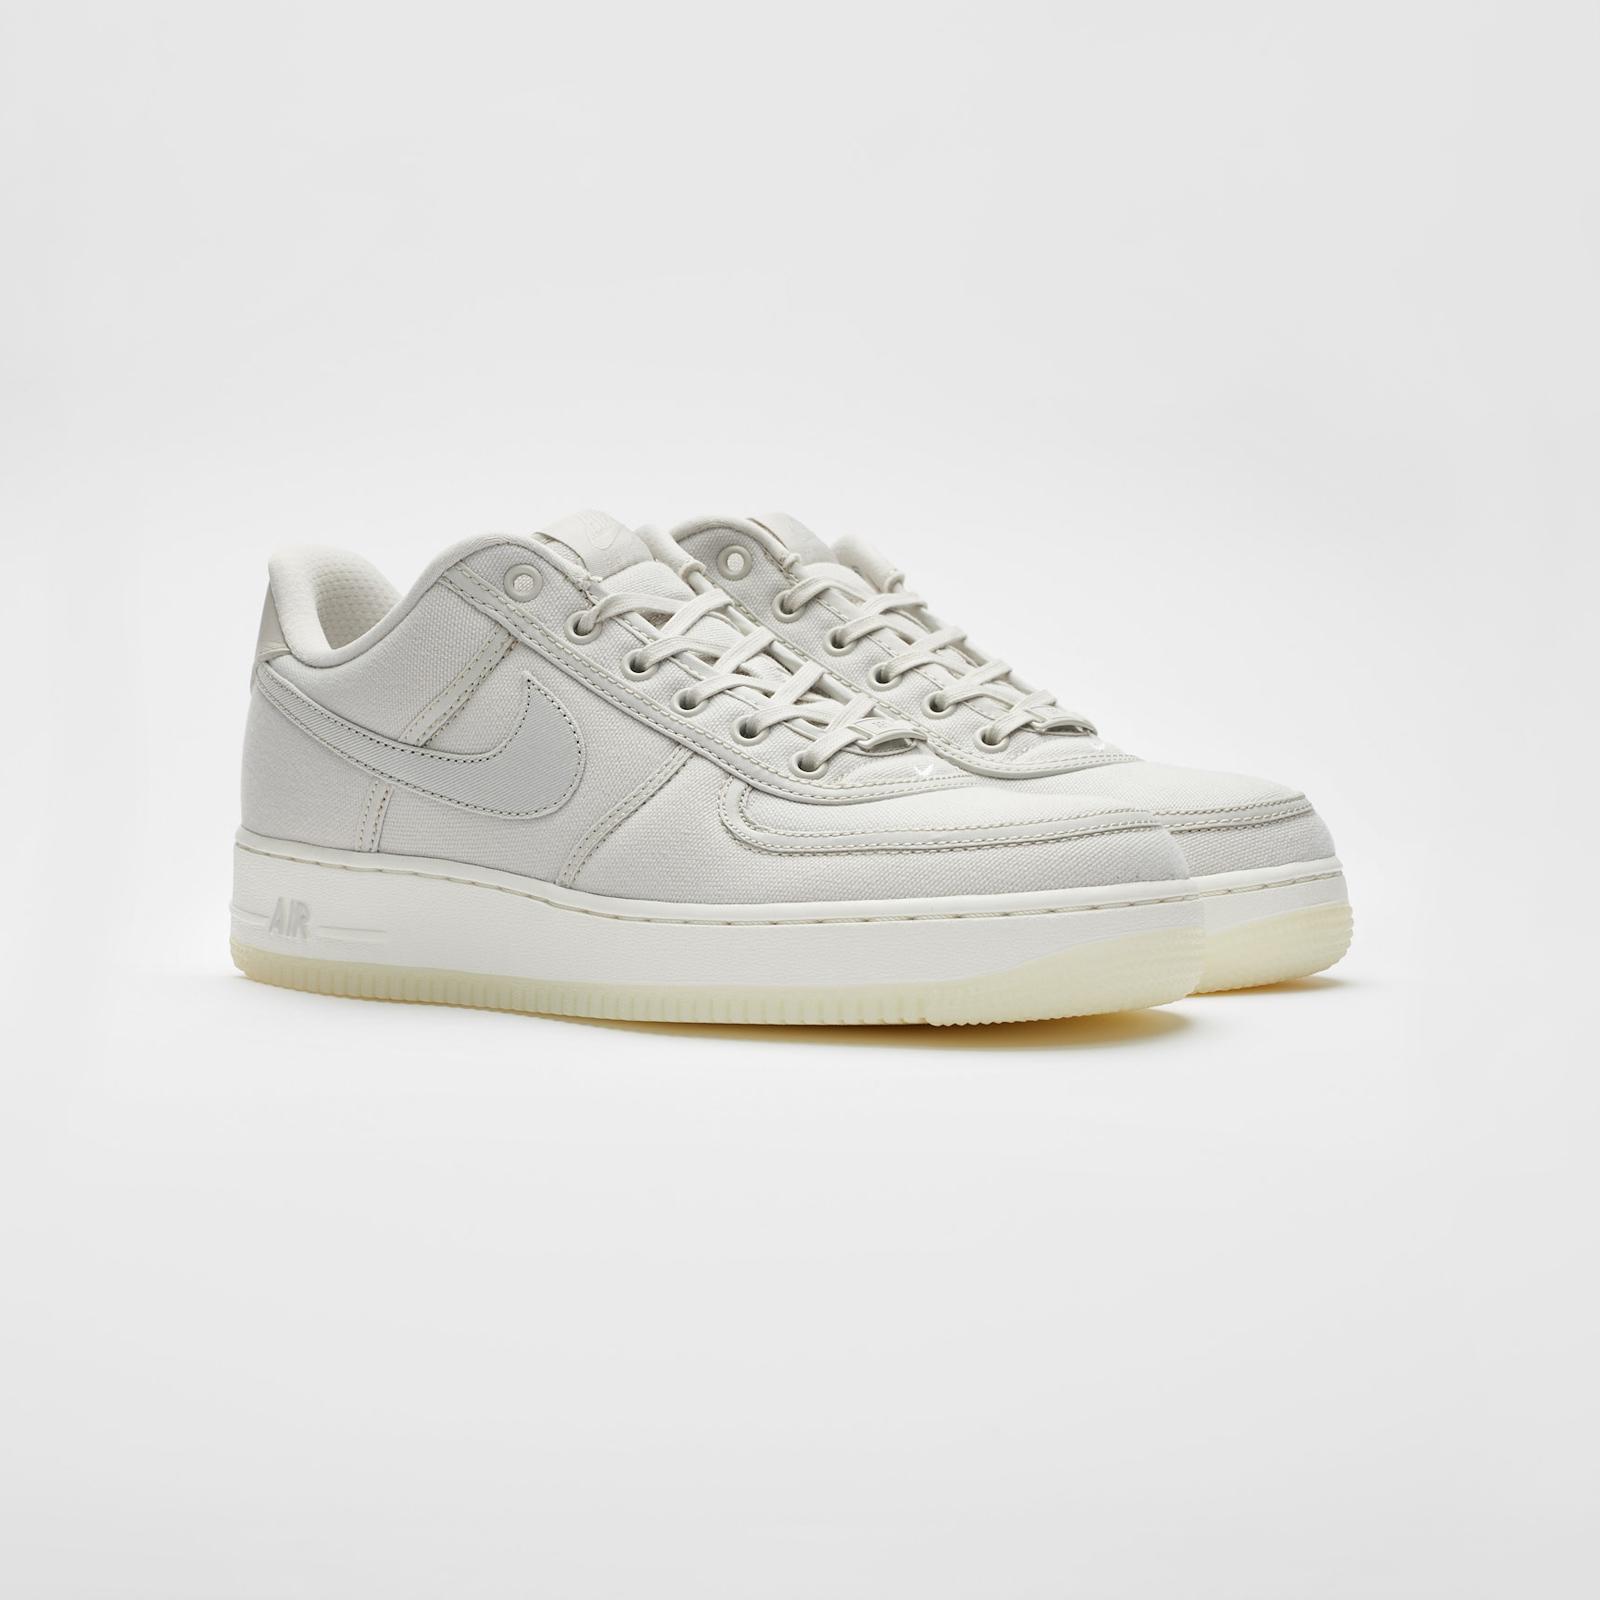 fb27f3f5be5 Nike Air Force 1 Low Retro QS Cnvs - Ah1067-003 - Sneakersnstuff ...